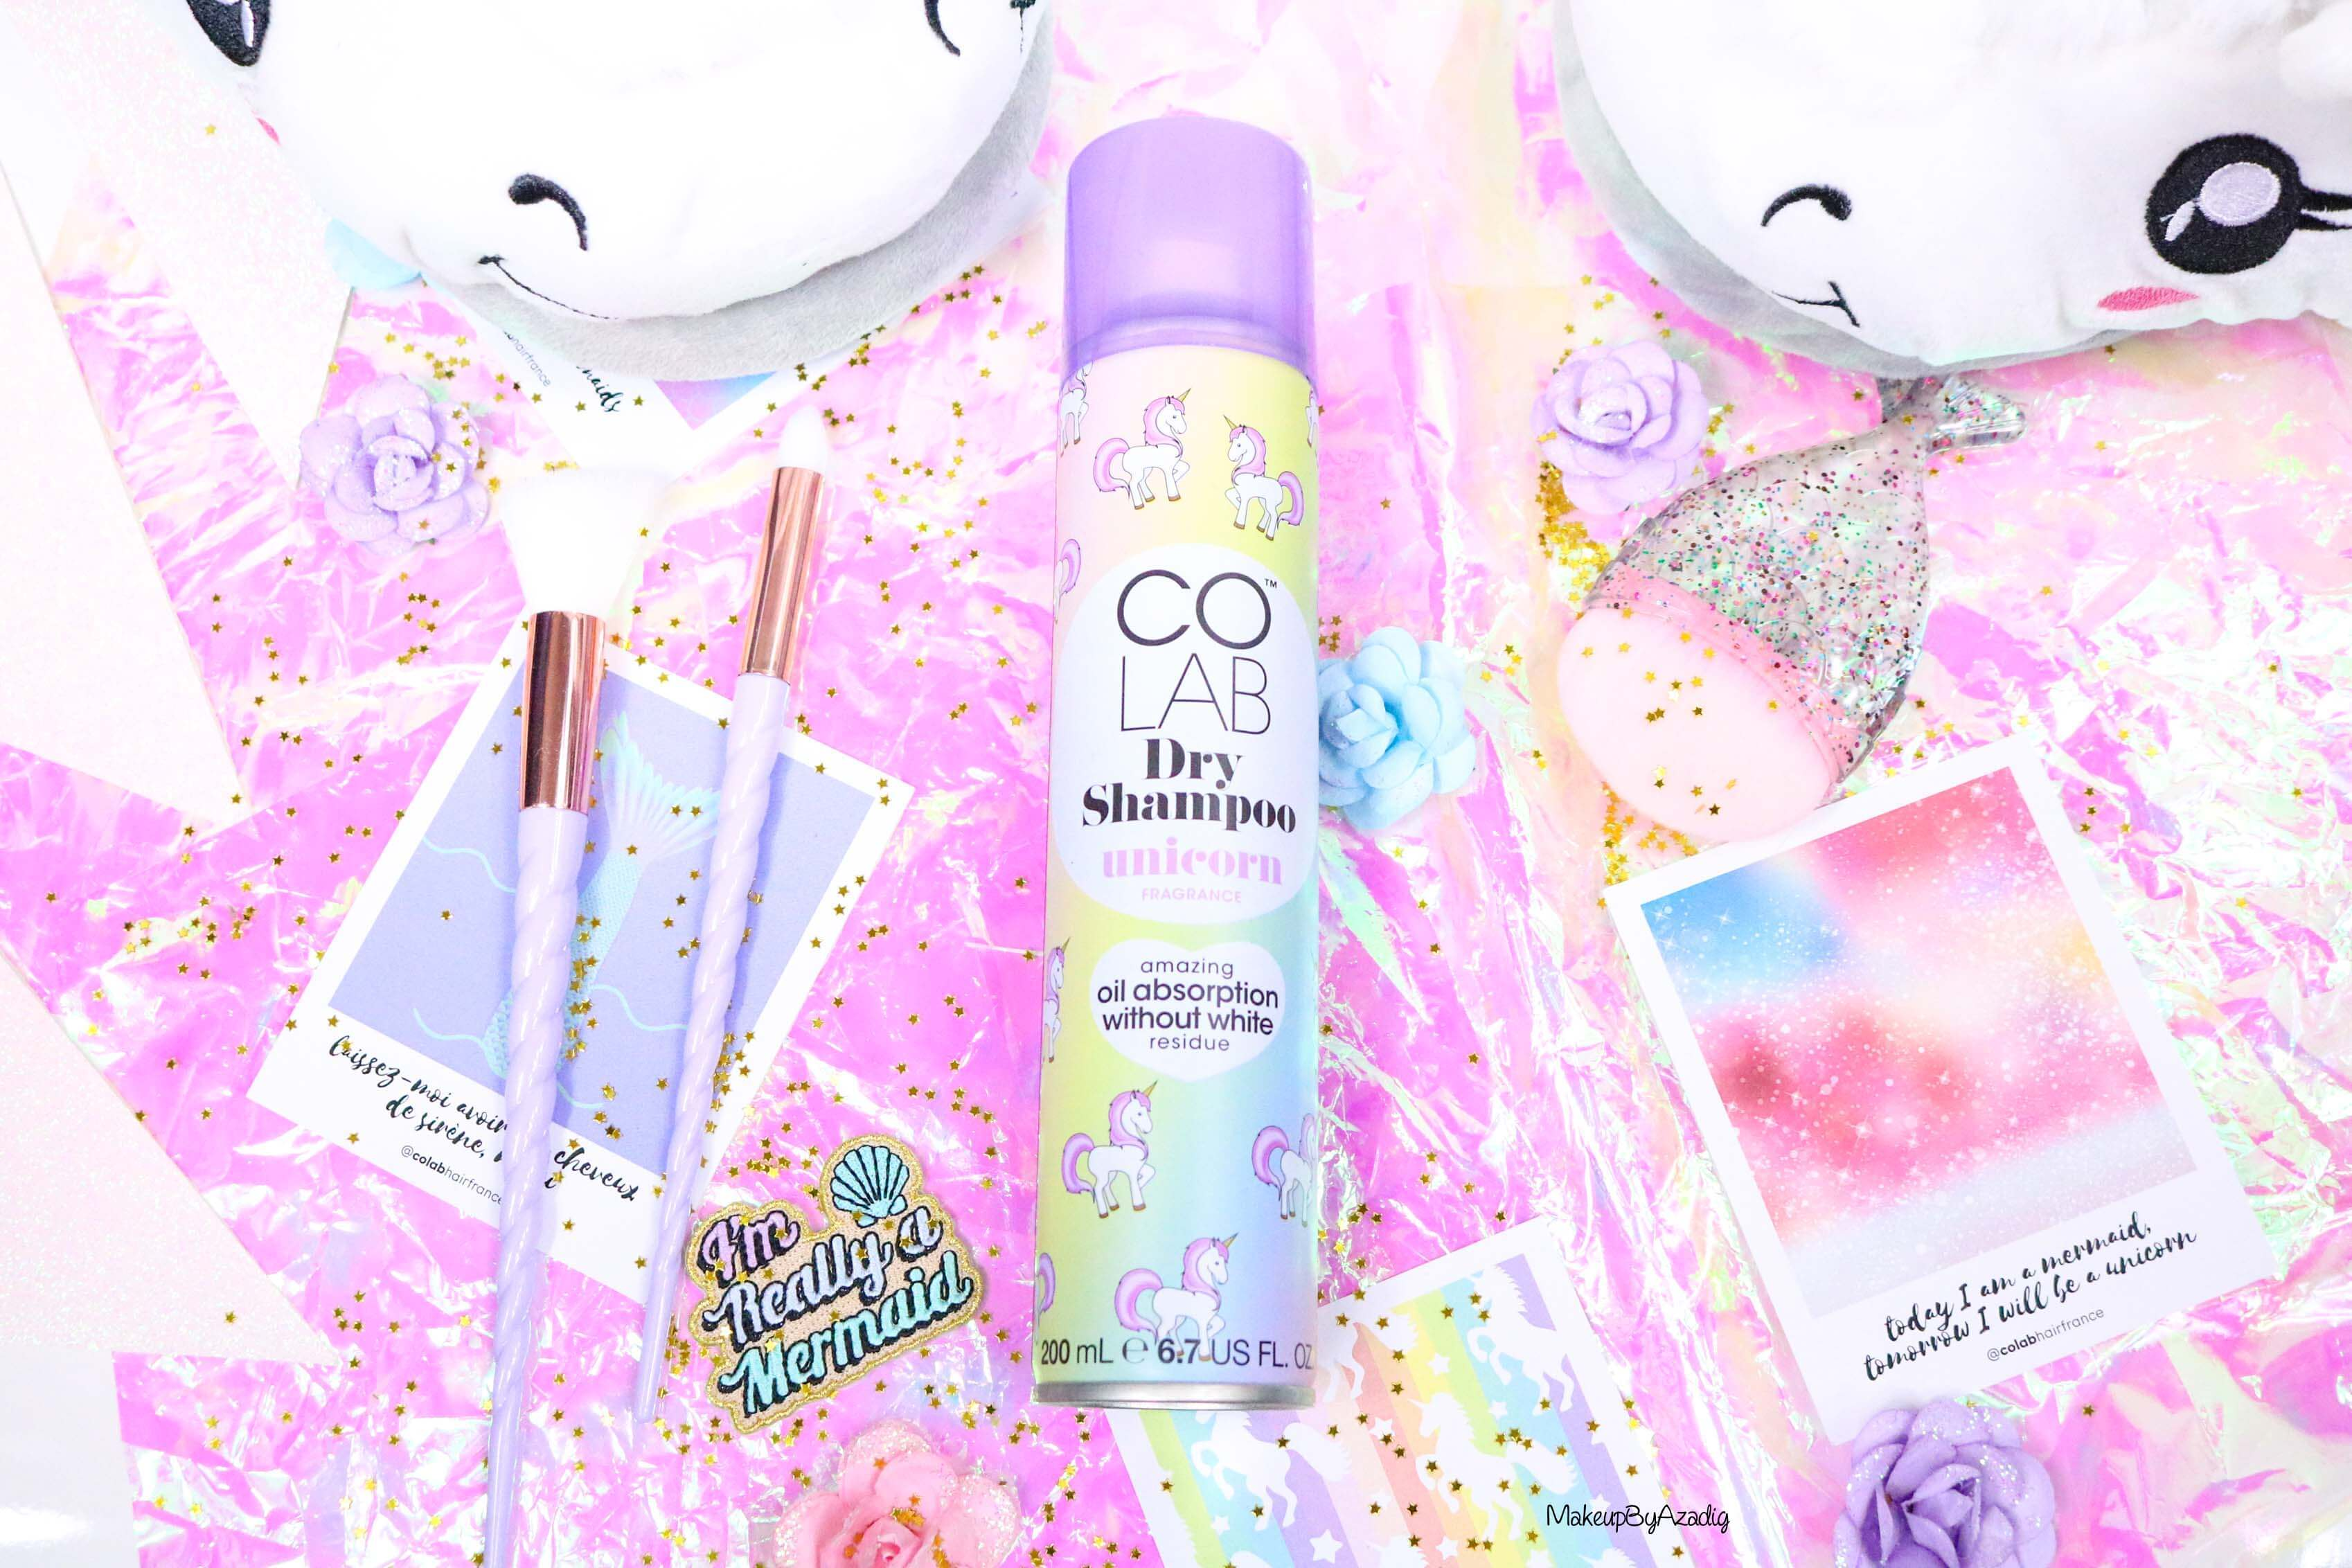 revue-shampooing-sec-colab-batiste-fresh-unicorn-monoprix-feelunique-prix-avis--soin-capillaire-efficacite-makeupbyazadig-fairy